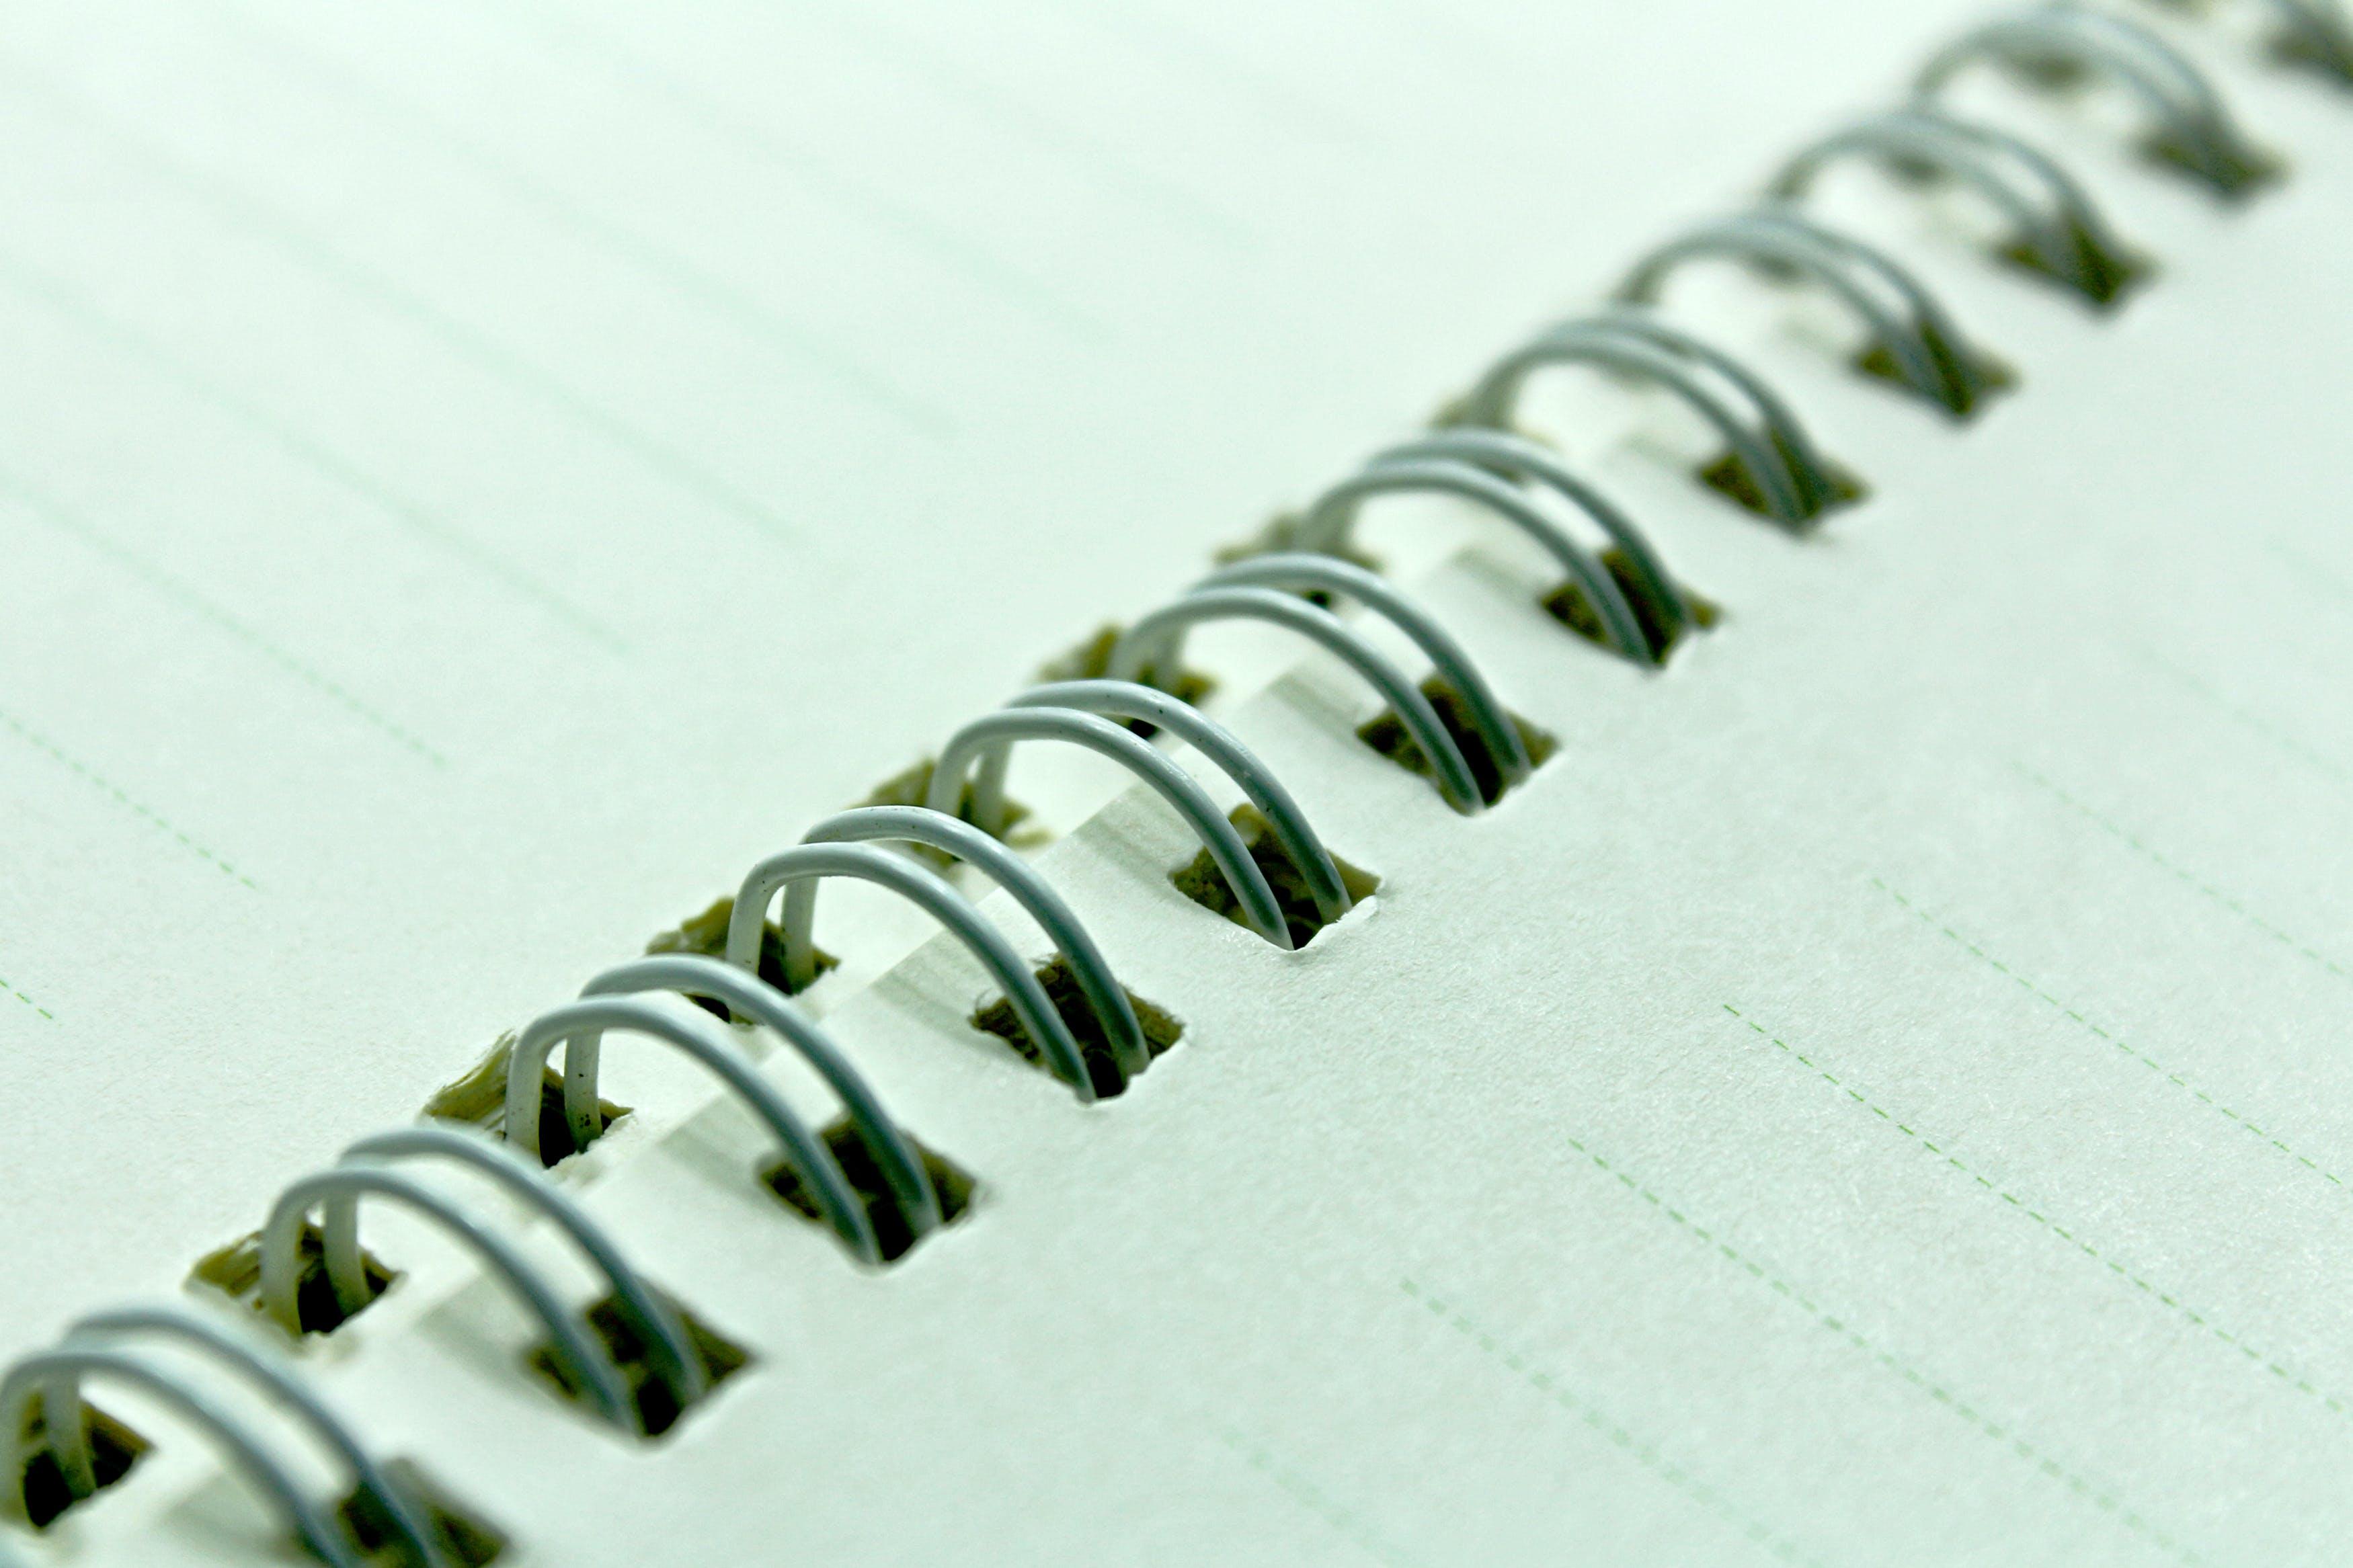 binder, blank, book bindings